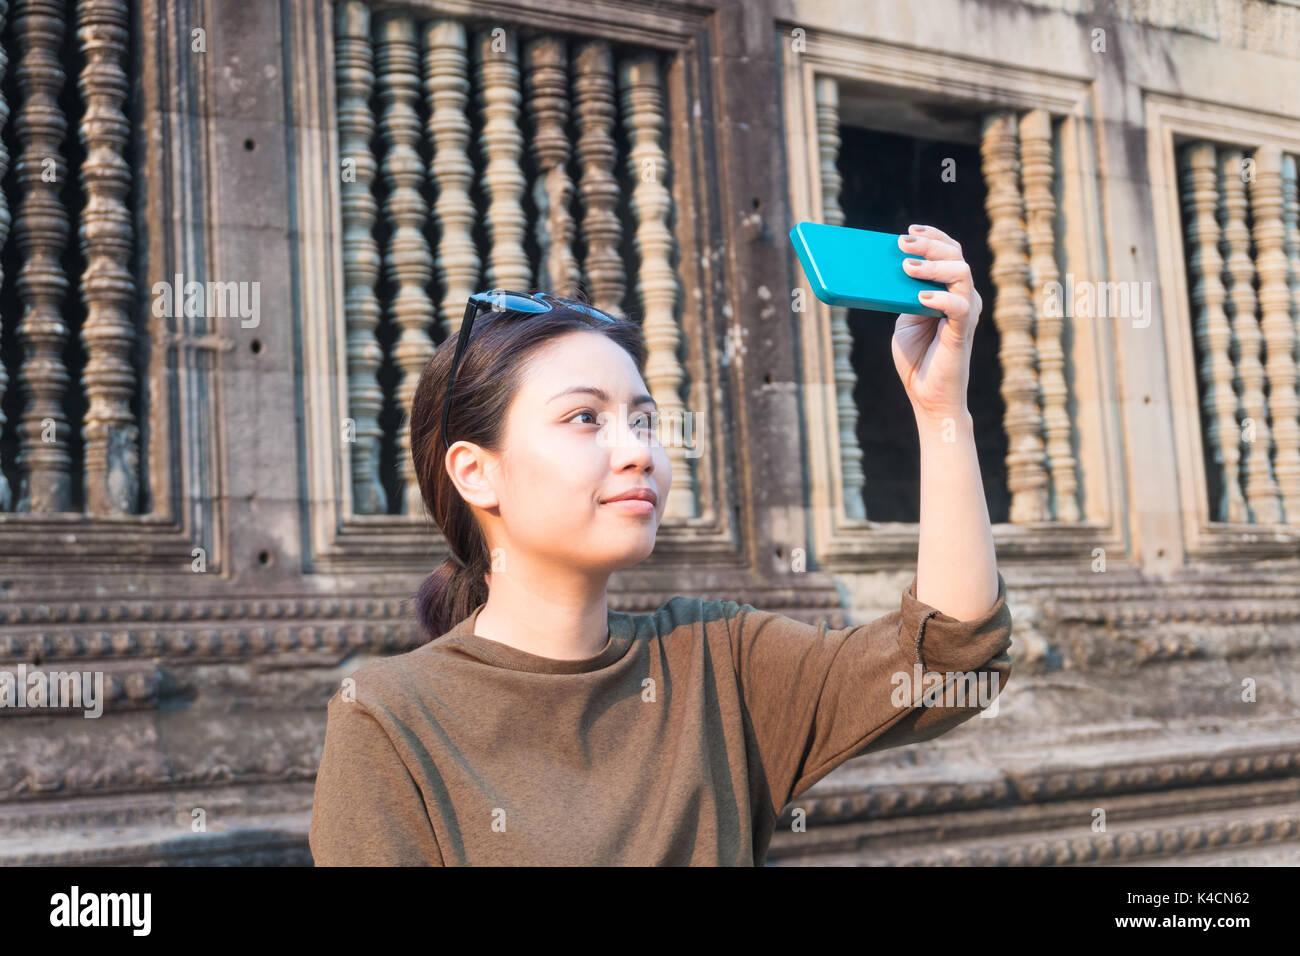 Voyageur femelle avec son smartphone selfies à Angkor Wat siem reap Cambodge Photo Stock